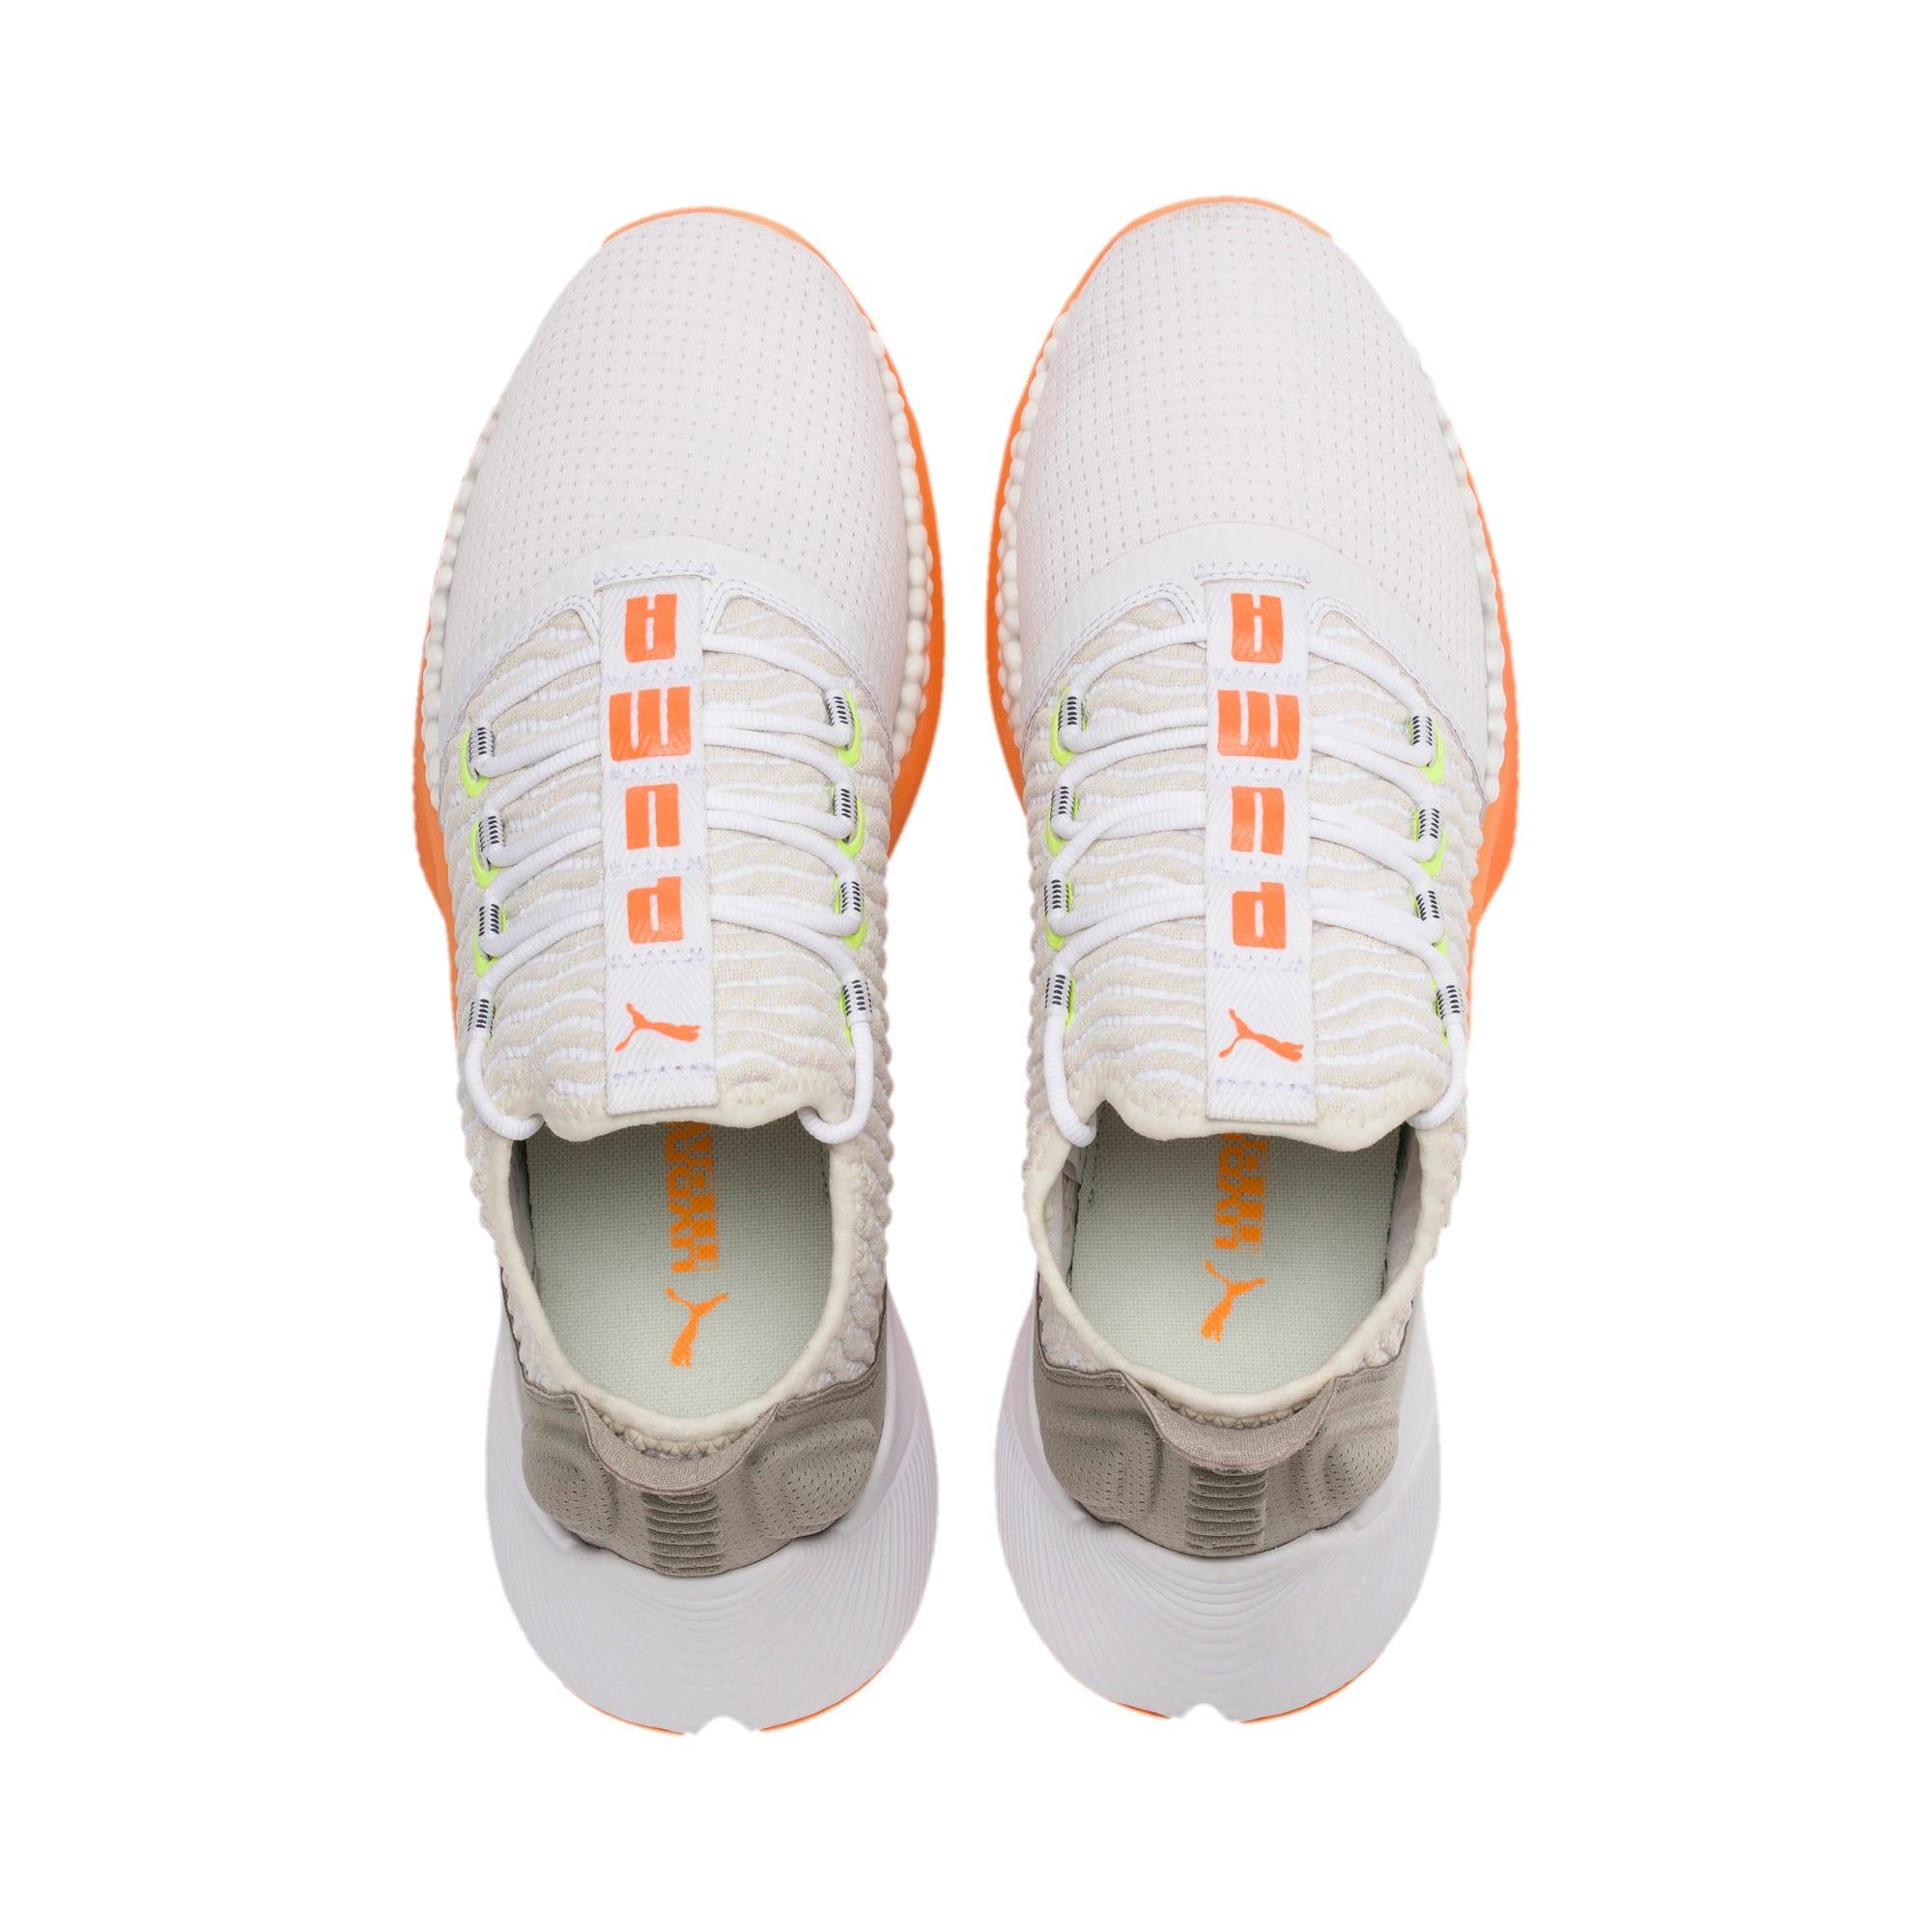 Thumbnail 6 of Xcelerator Daylight Running Shoes, White-VGray-Orange-Yellow, medium